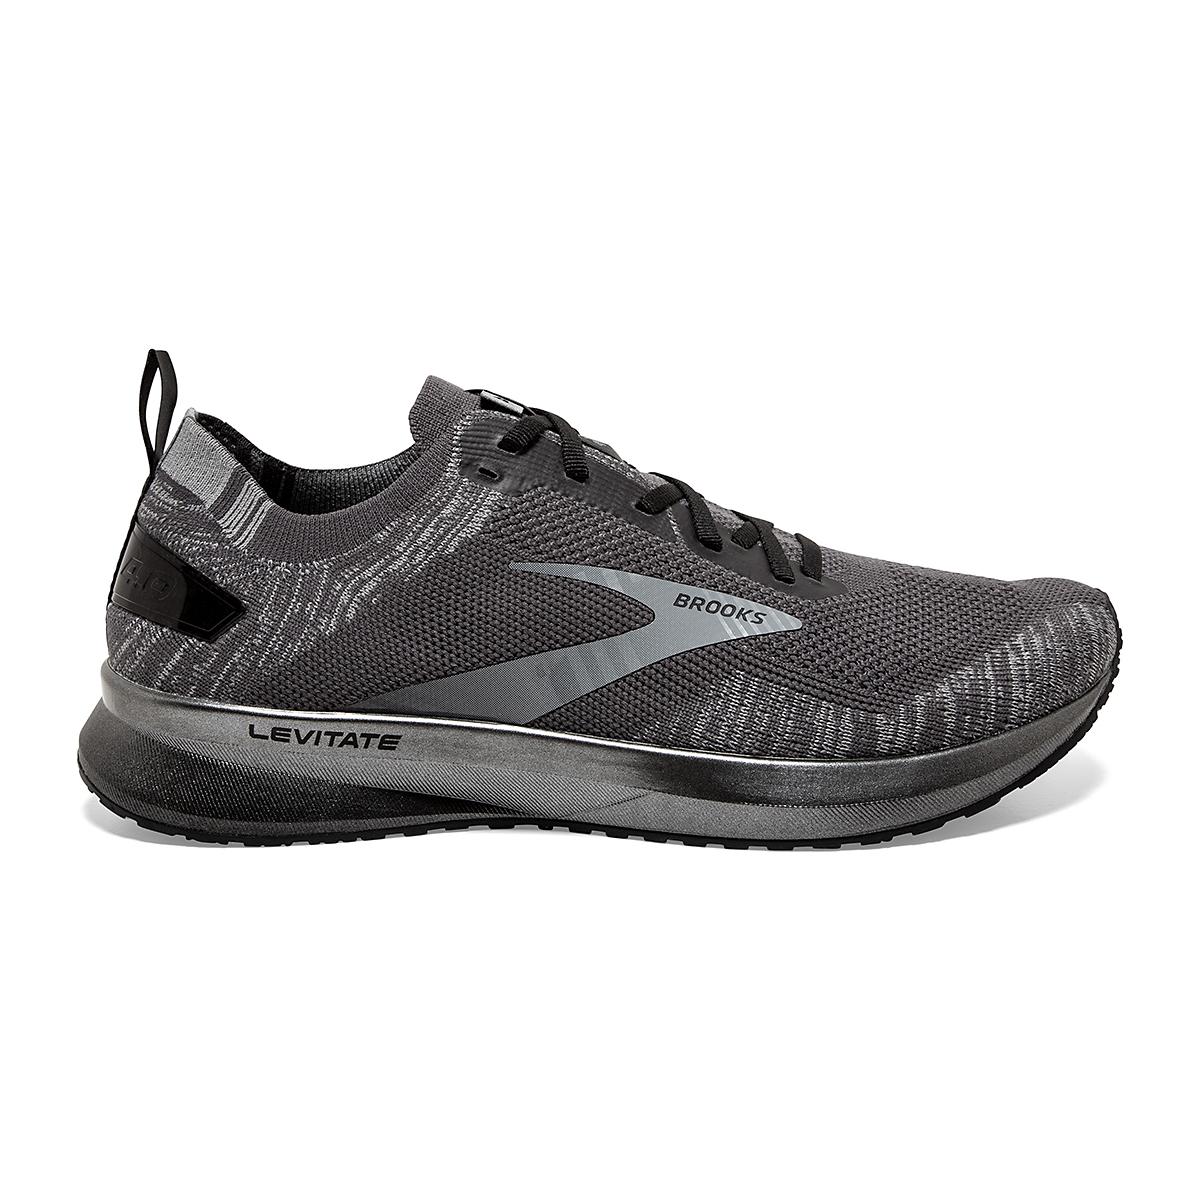 Men's Brooks Levitate 4 Running Shoe - Color: Blackened Pearl/Grey/Black - Size: 8 - Width: Regular, Blackened Pearl/Grey/Black, large, image 1